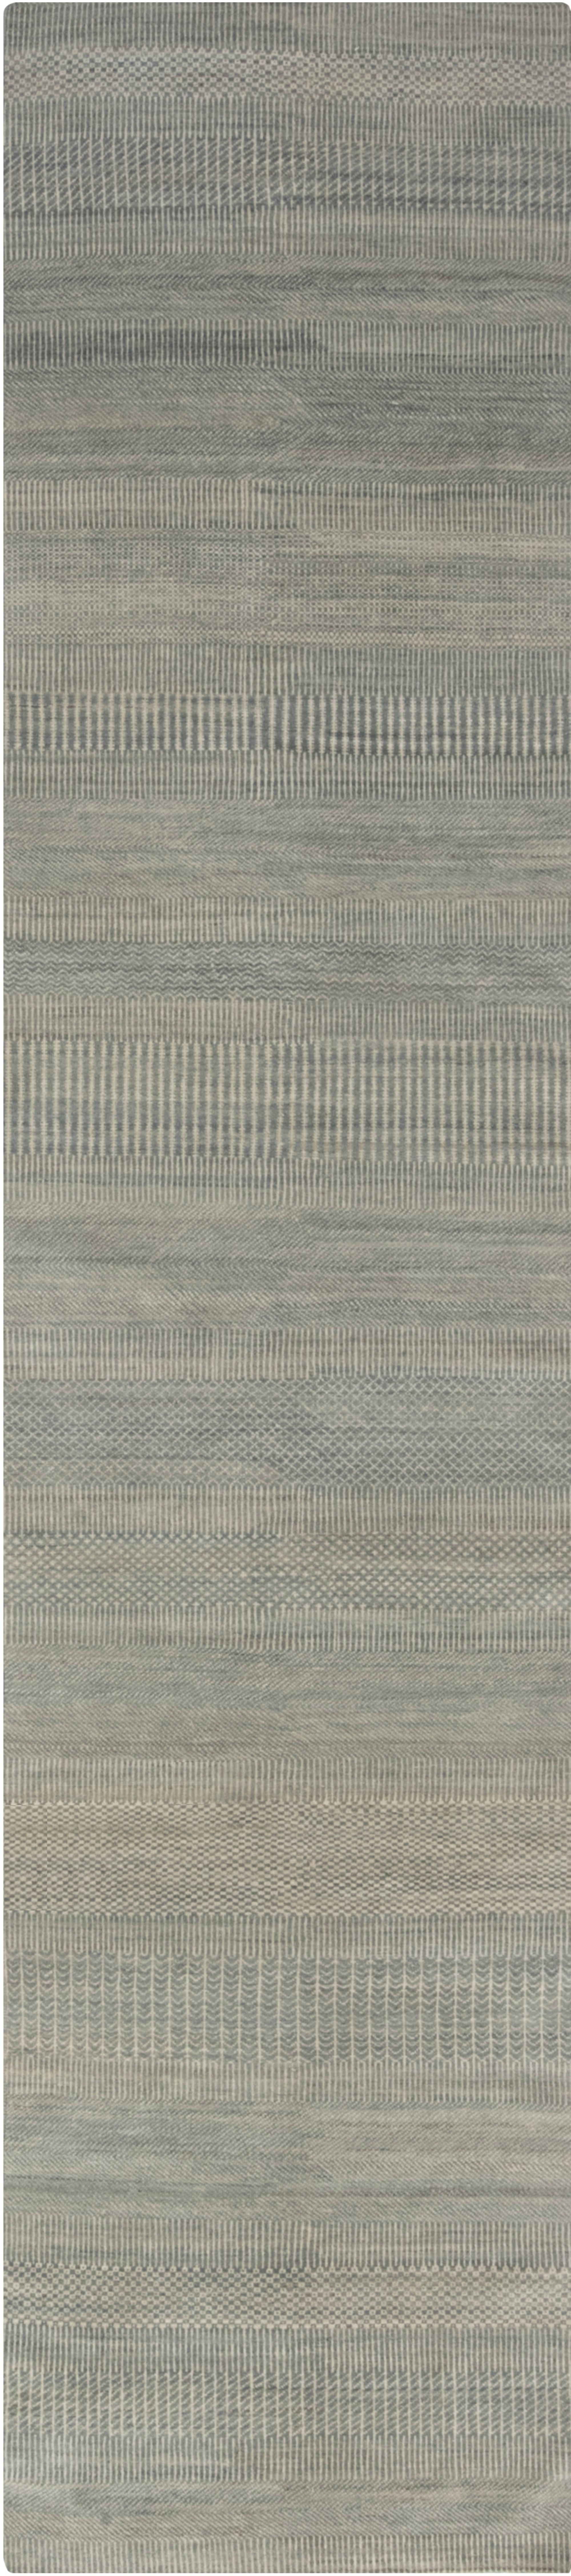 Contemporary Flat Weave Runner N11771